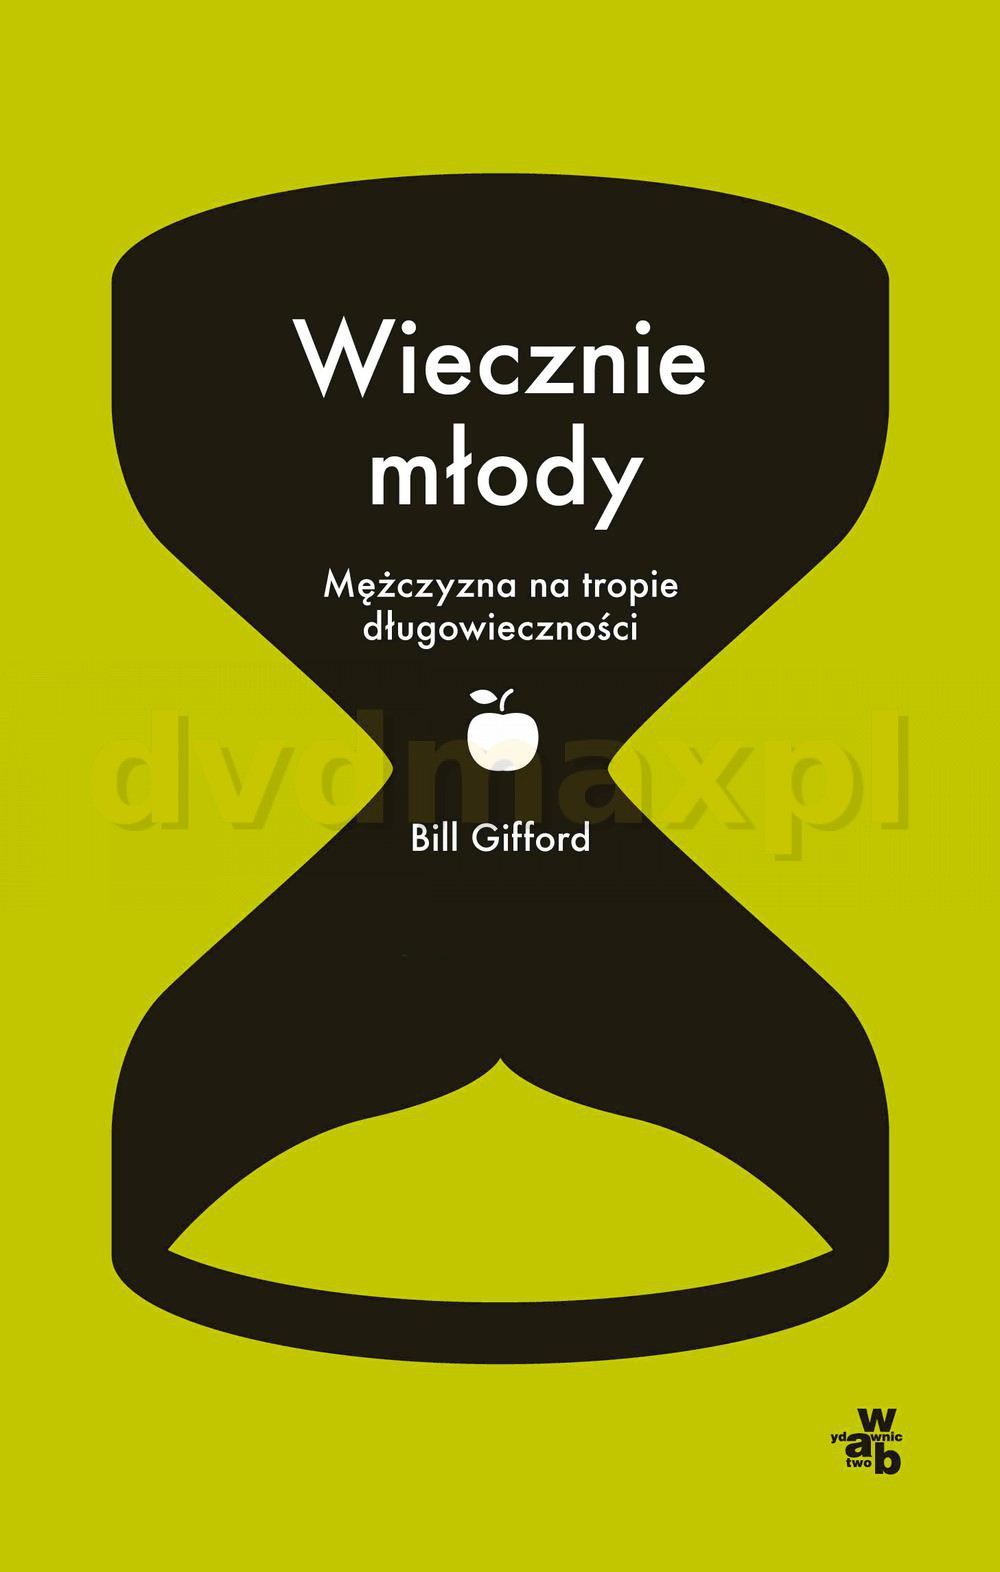 Wiecznie młody - Bill Gifford [KSIĄŻKA] - Bill Gifford